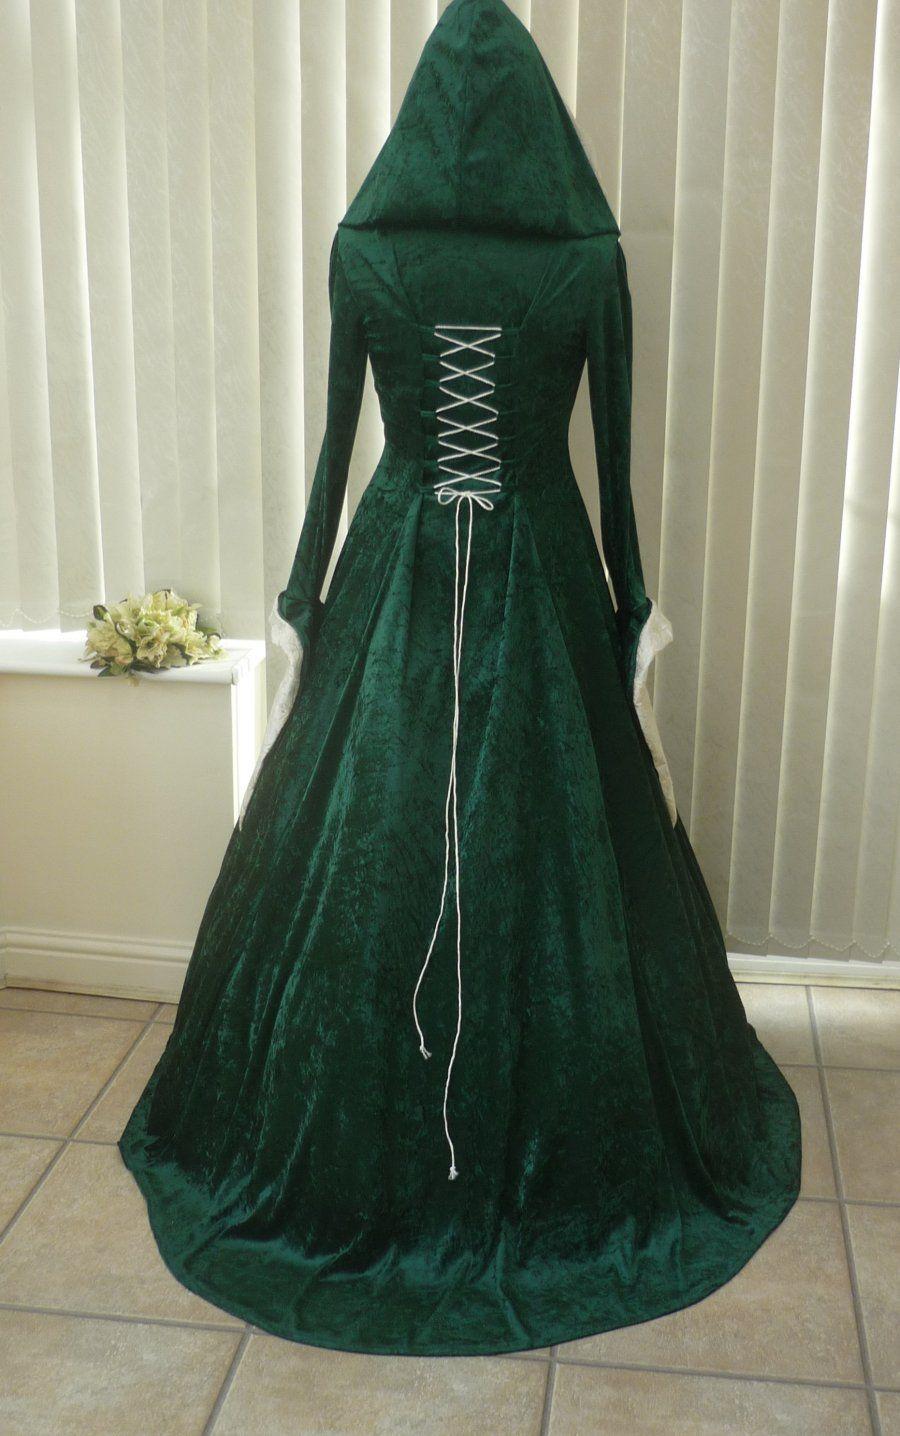 Medieval Celtic Pagan Wedding Dress Green Cream Hood